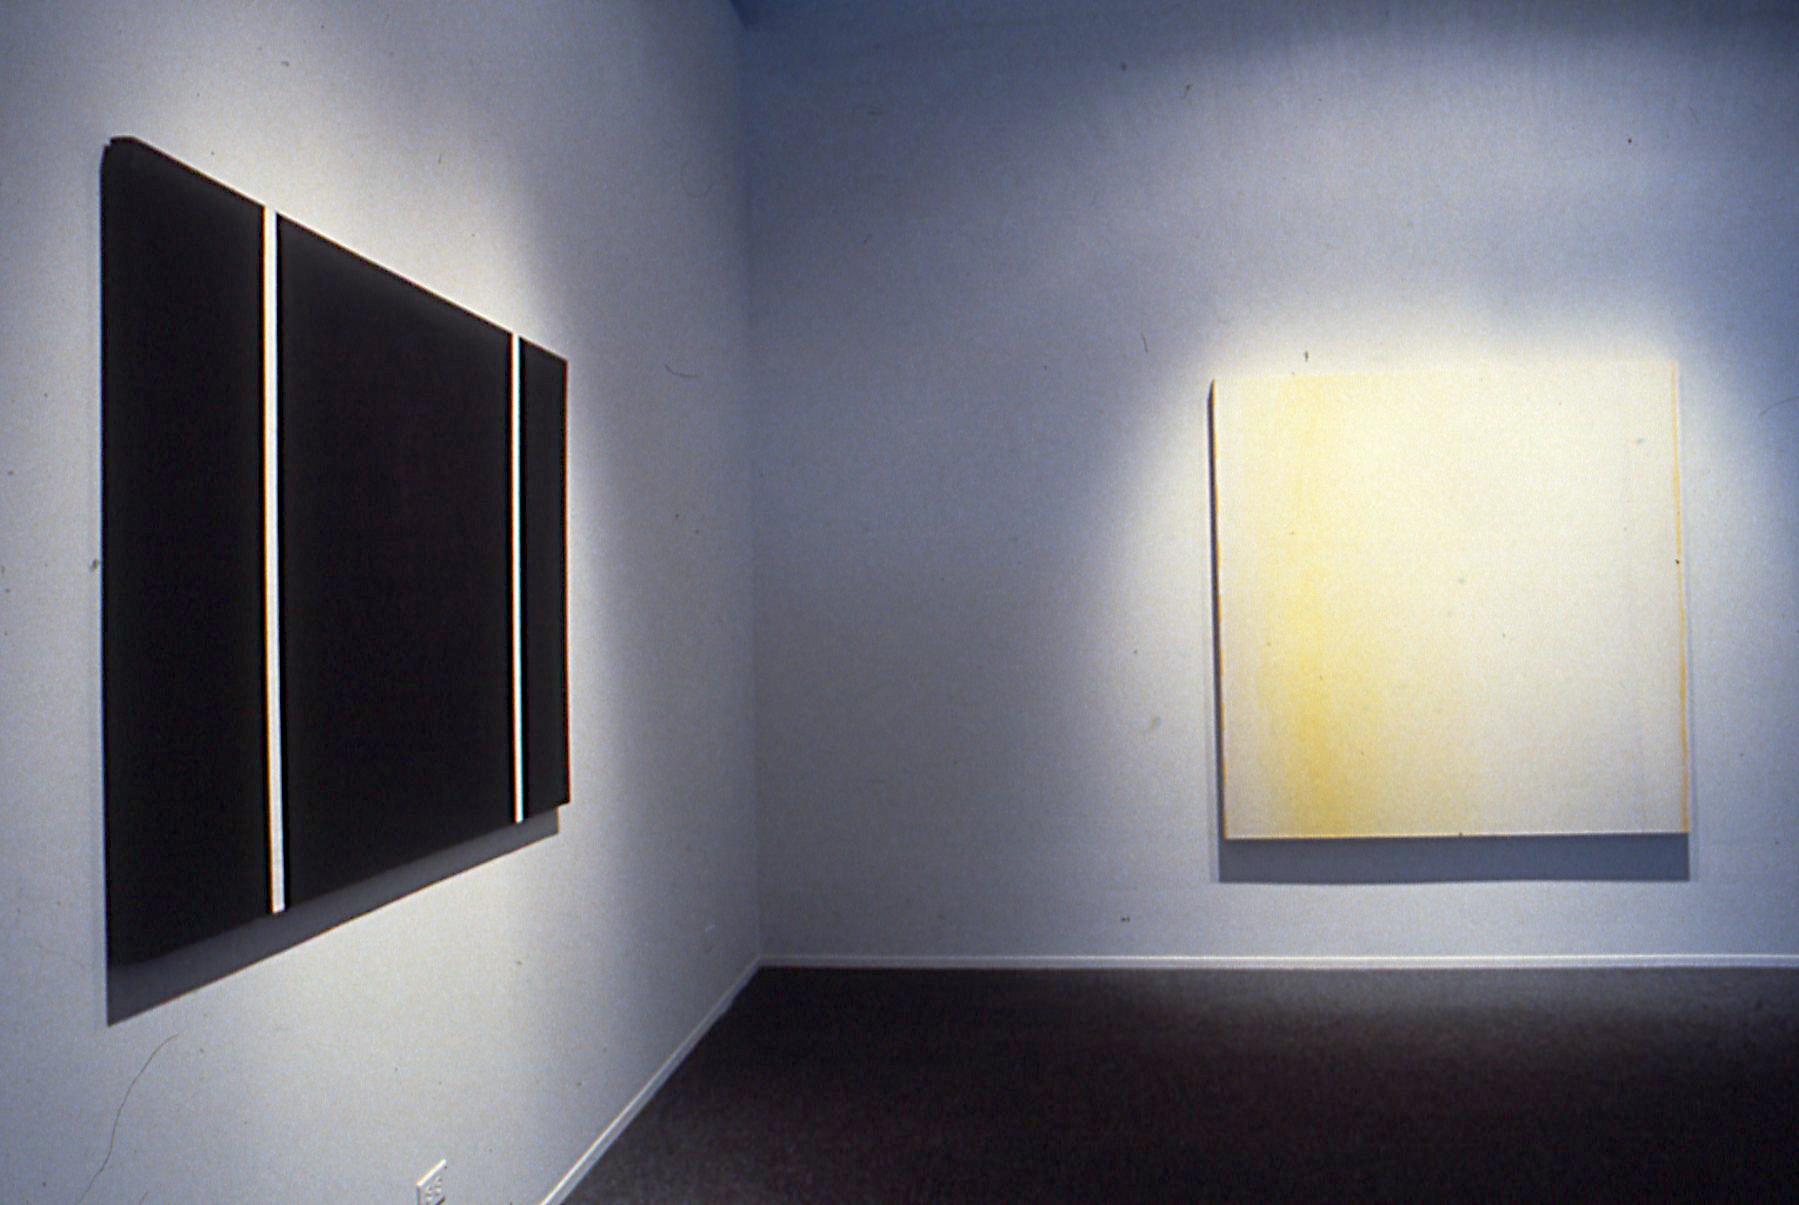 1994: CLARITY inst. Mark Moore Gallery, Santa Monica, 1994. John McLaughlin, JGR 3